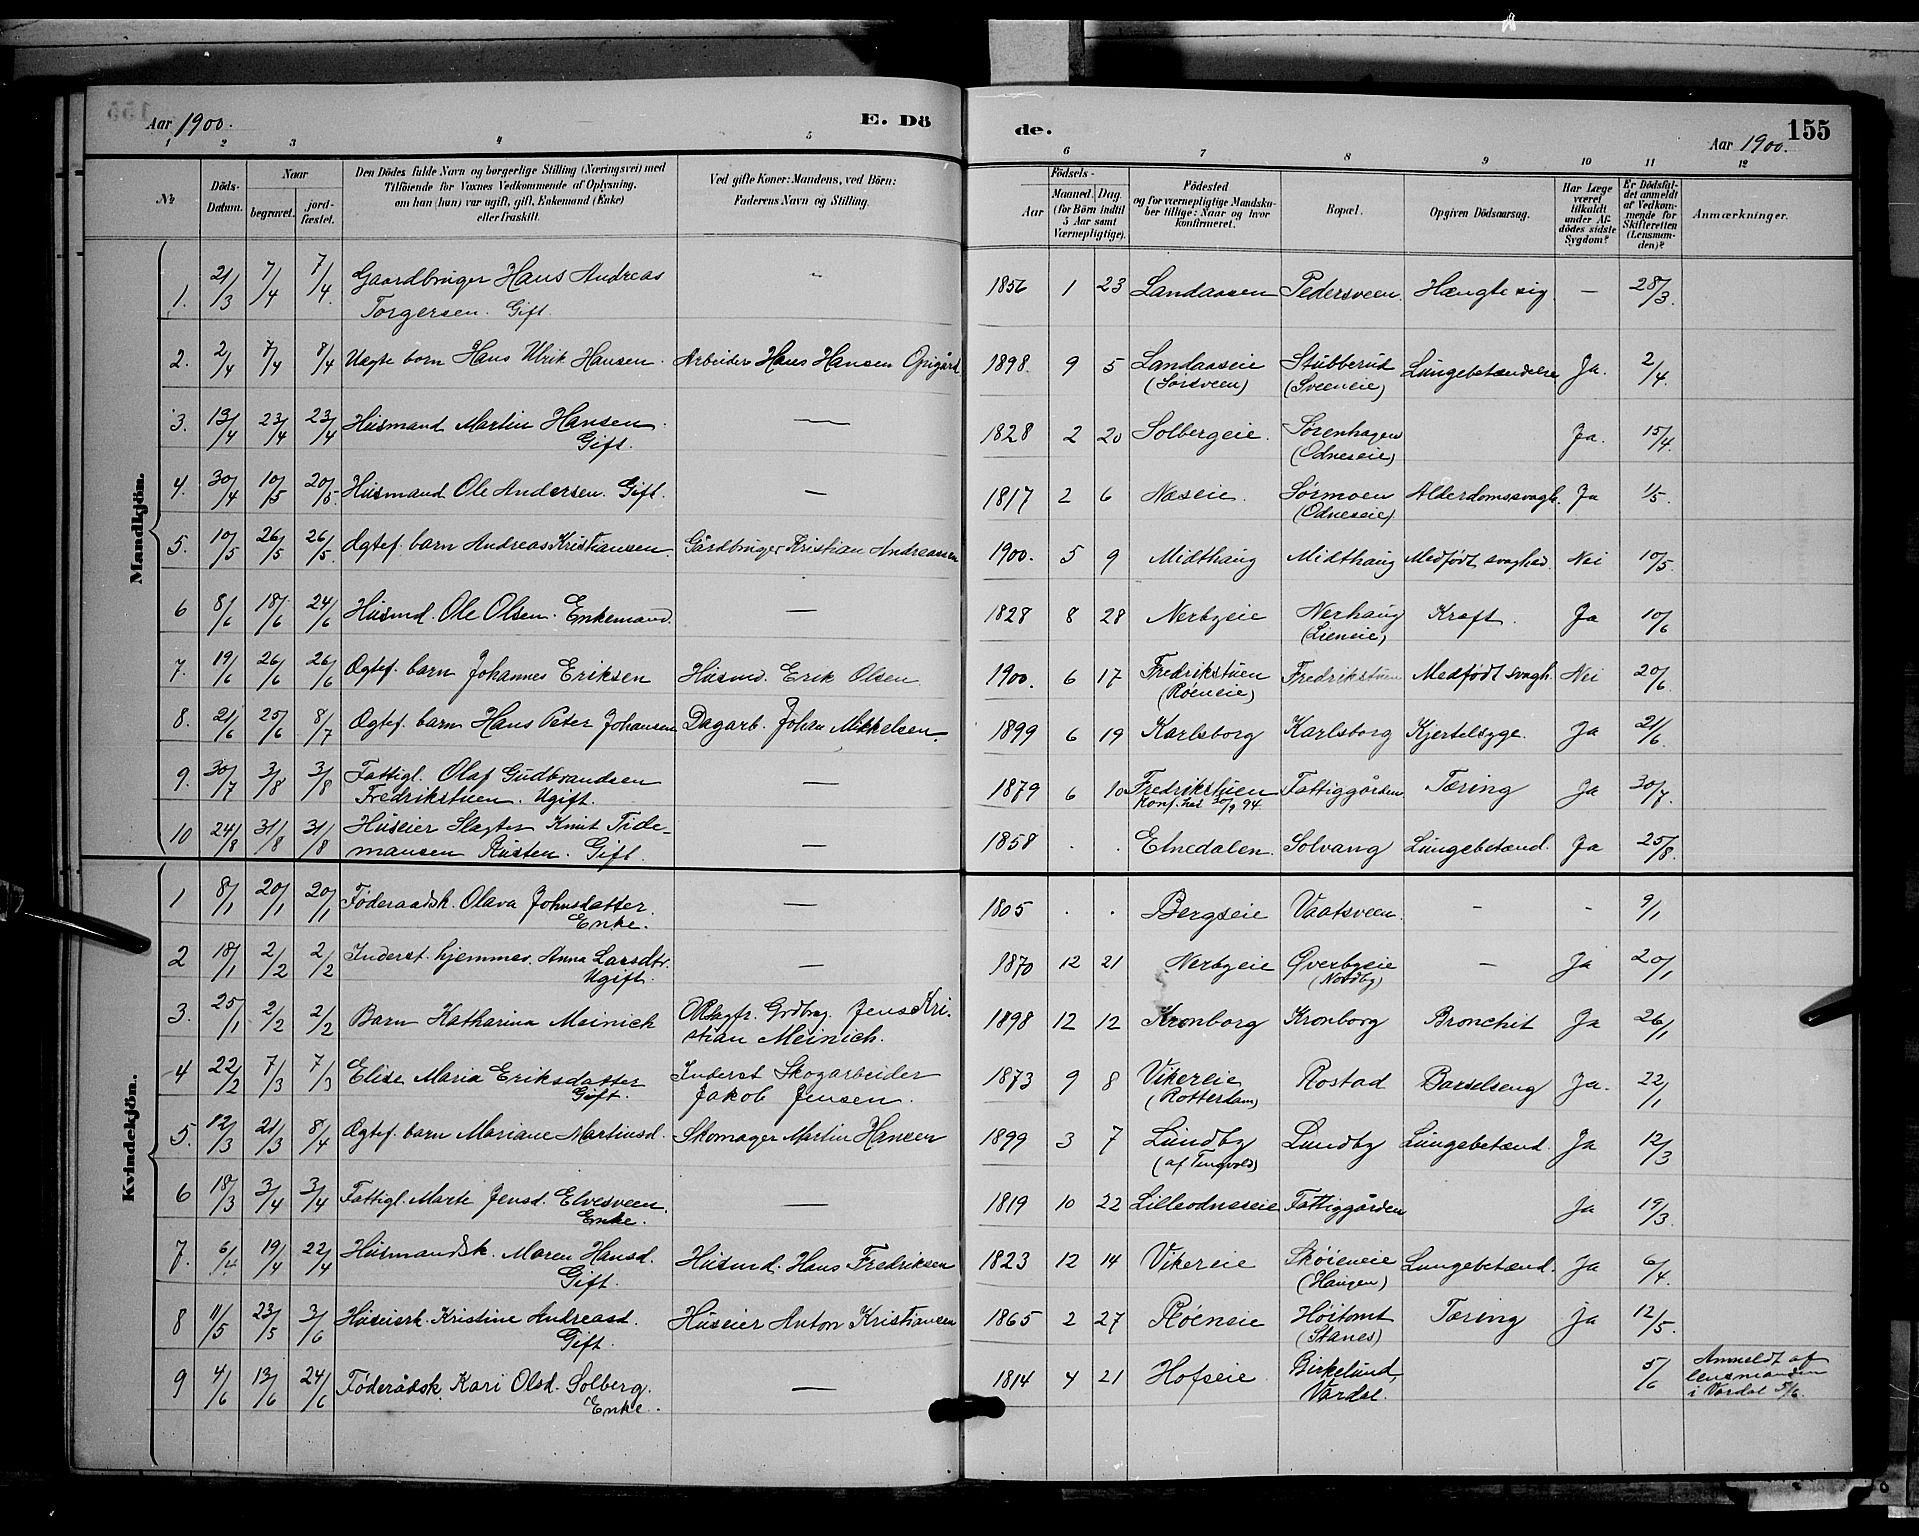 SAH, Søndre Land prestekontor, L/L0003: Klokkerbok nr. 3, 1884-1902, s. 155